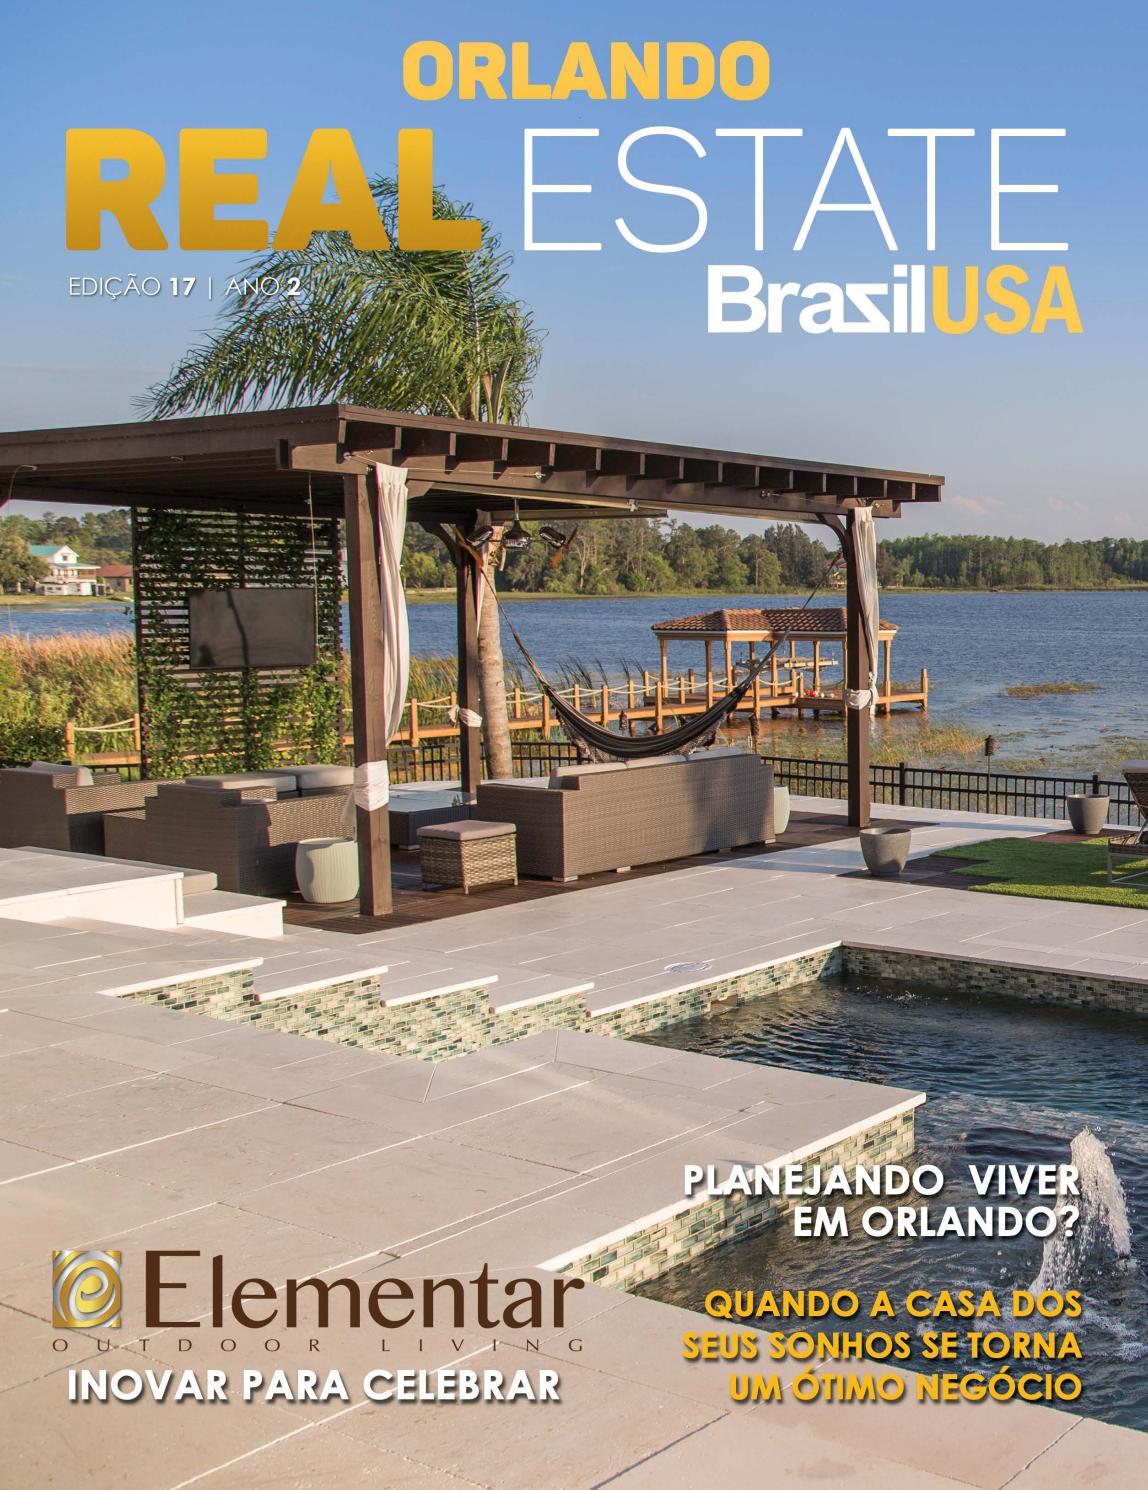 Brazilusa Orlando Real Estate#17 (português) by BRAZIL USA ... on Elementar Outdoor Living id=42183